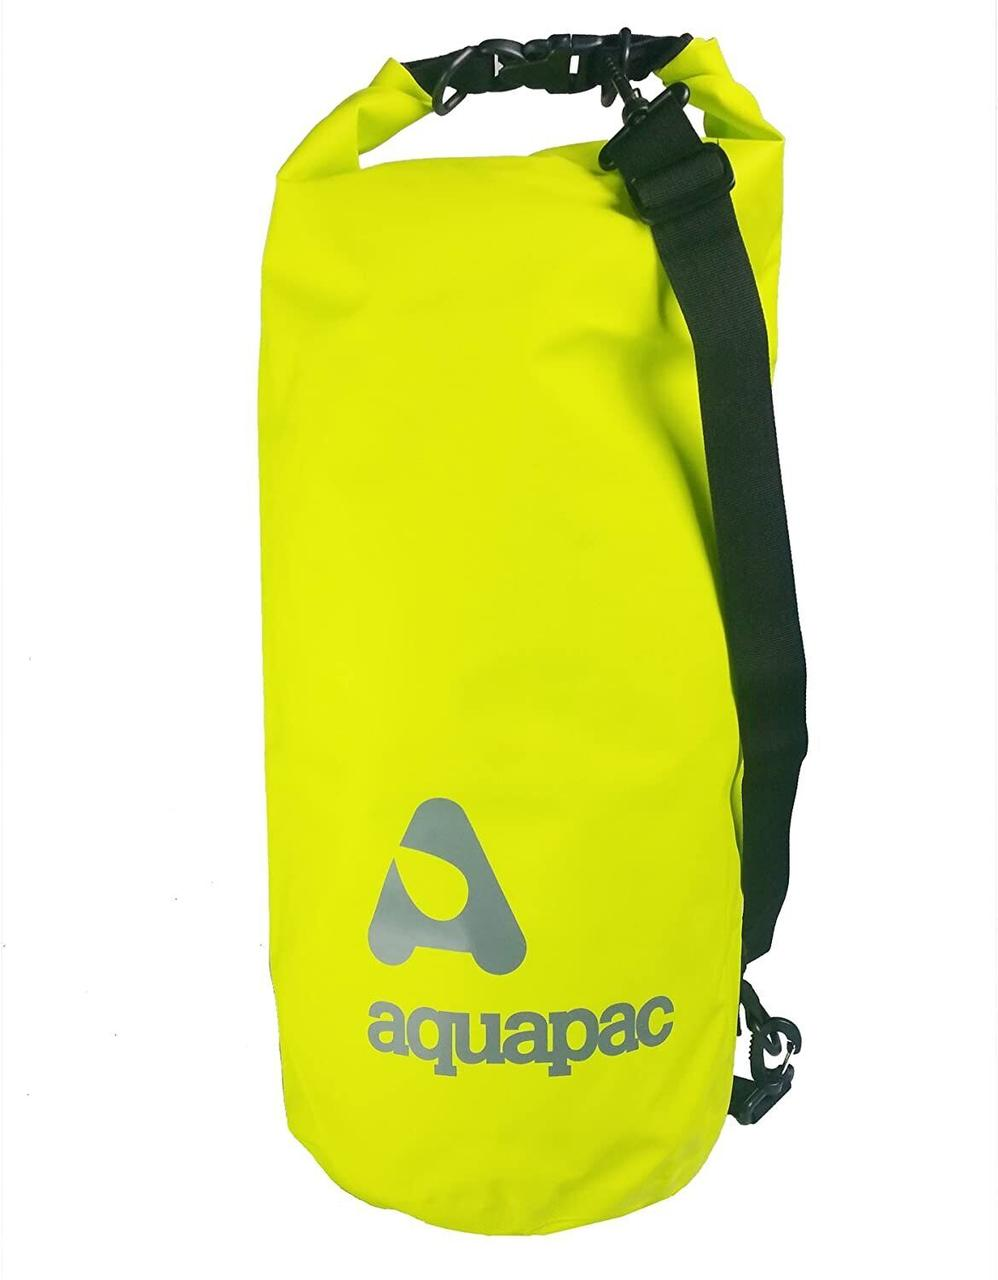 Гермомешок Aquapac TrailProof™ Drybag with shoulder strap 70L acid green (737)